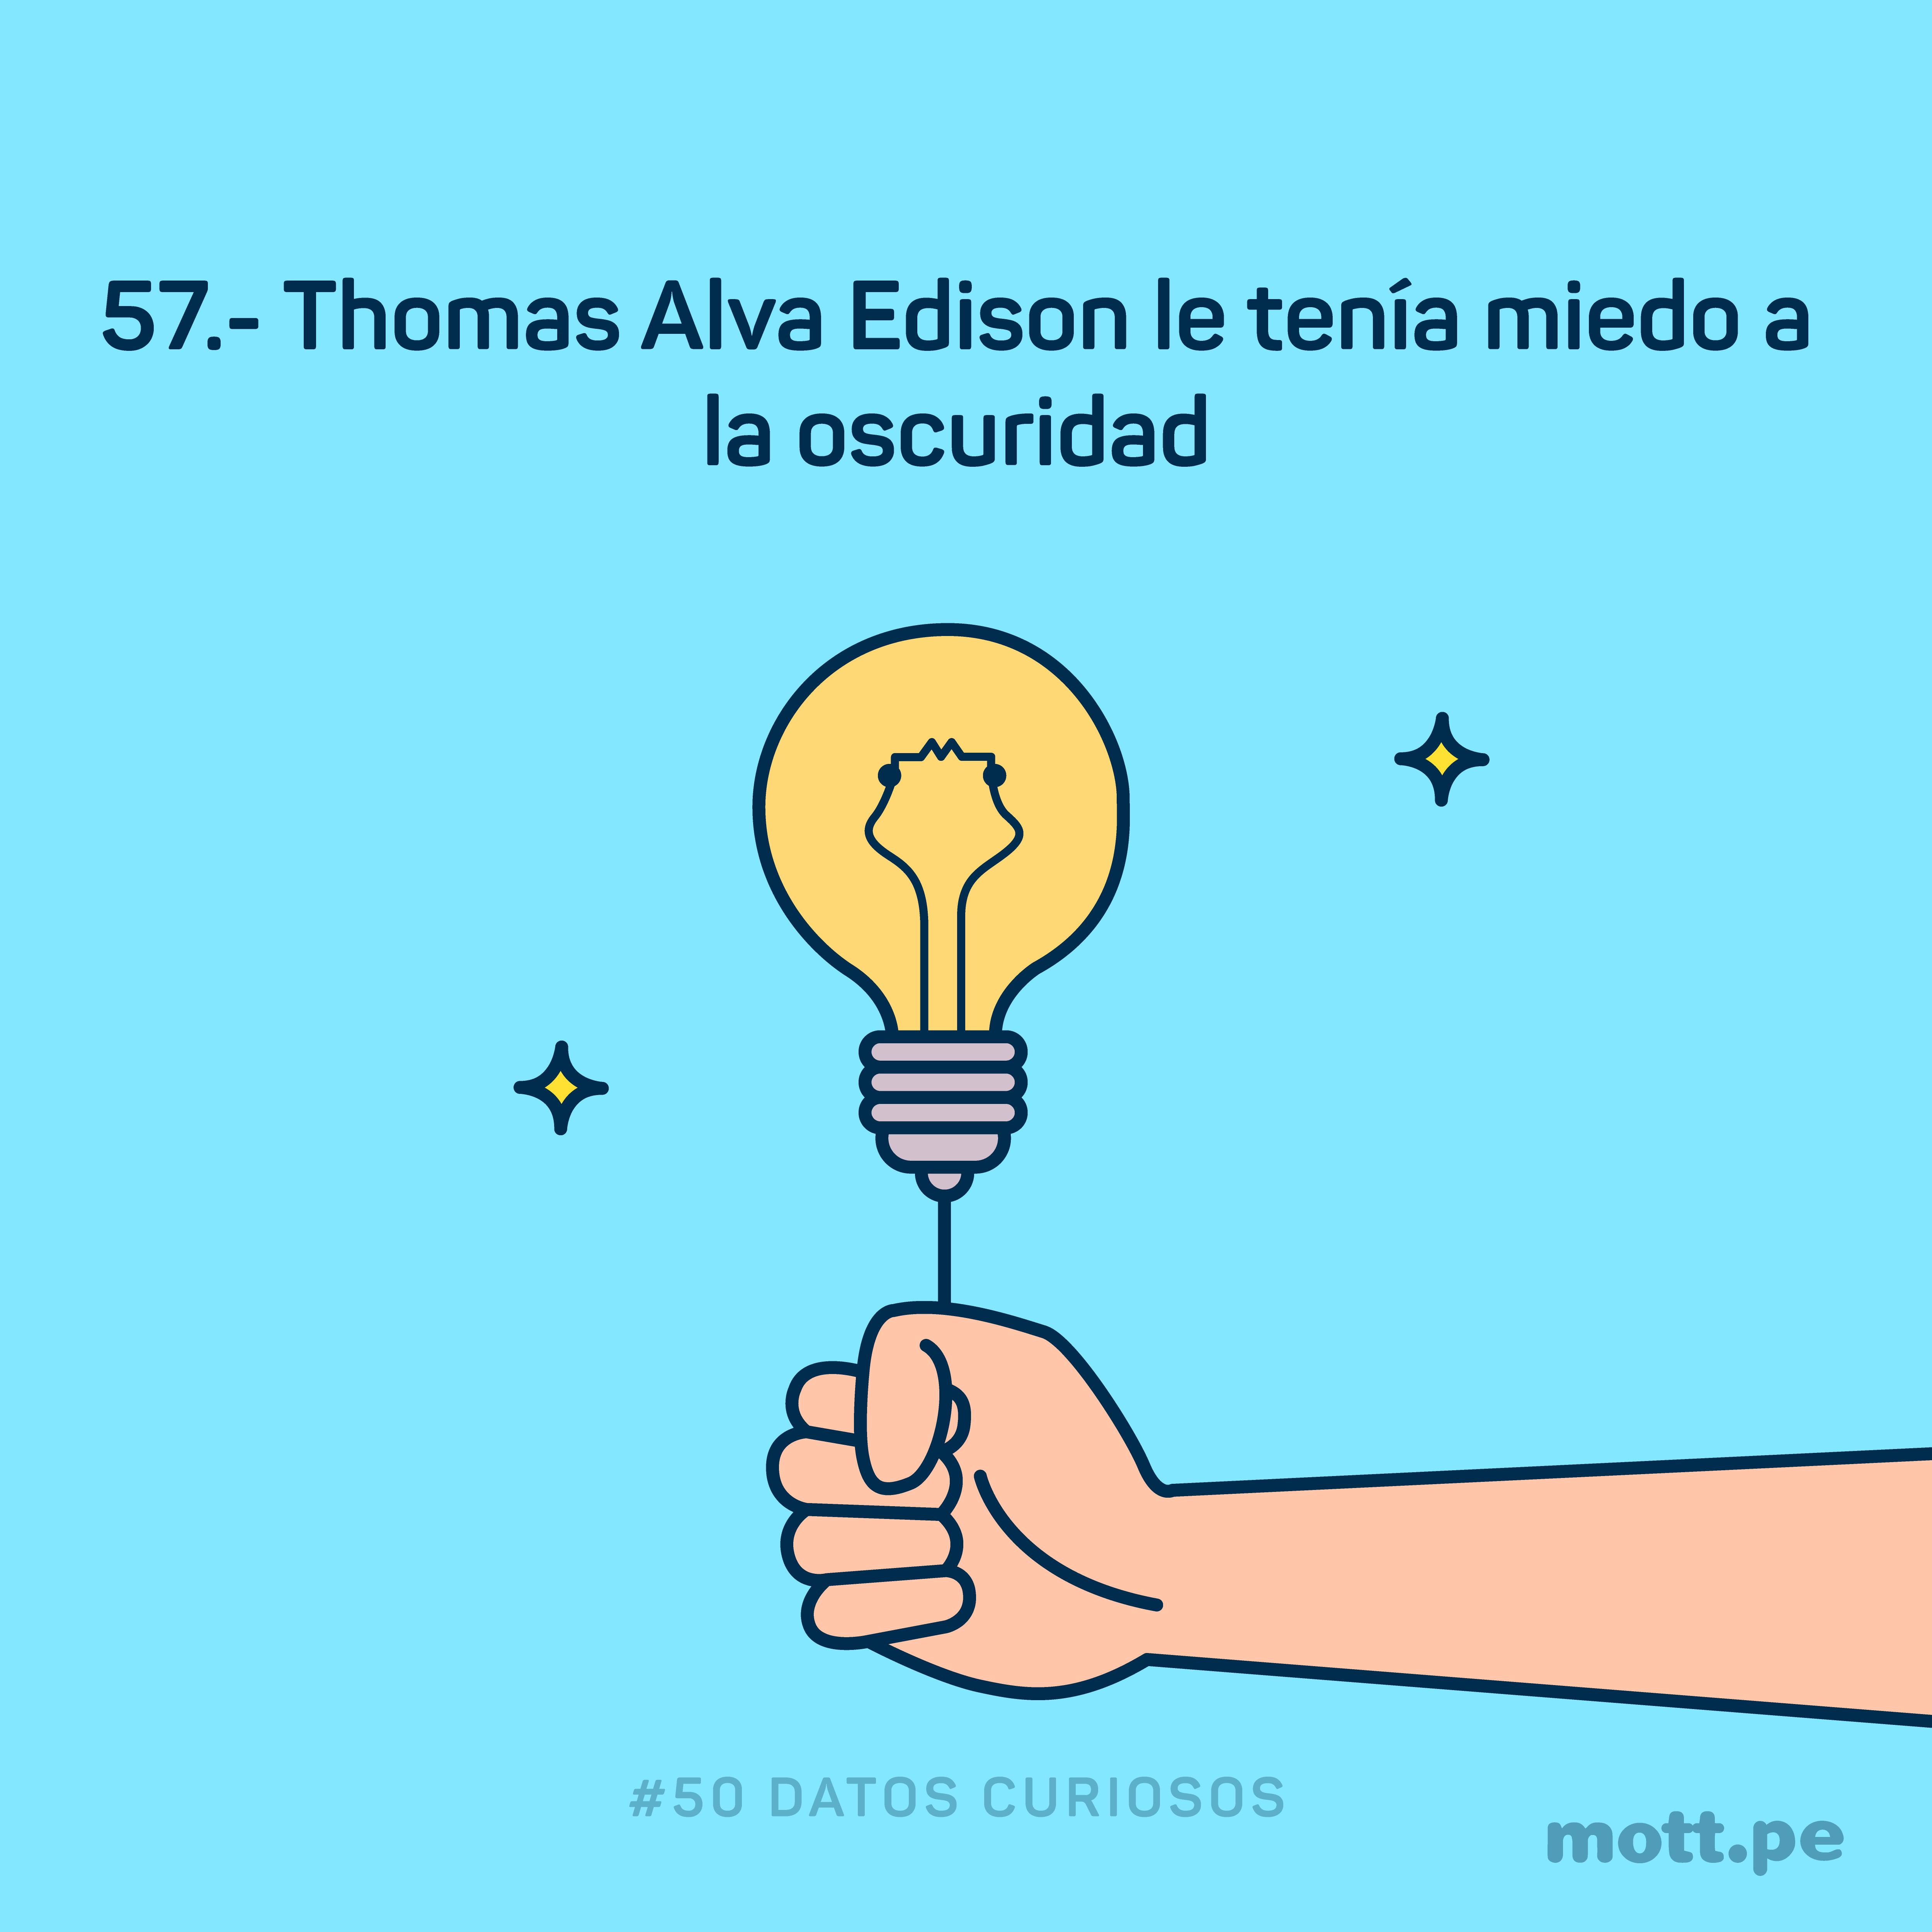 Thomas Alva Edison le temia a la oscuridad